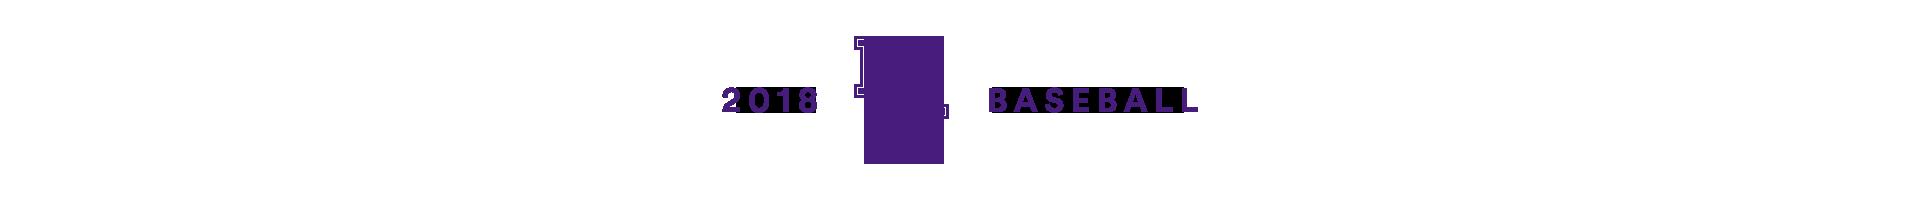 Lsu baseball clipart banner free Clint Self - LSU Baseball 2018 banner free